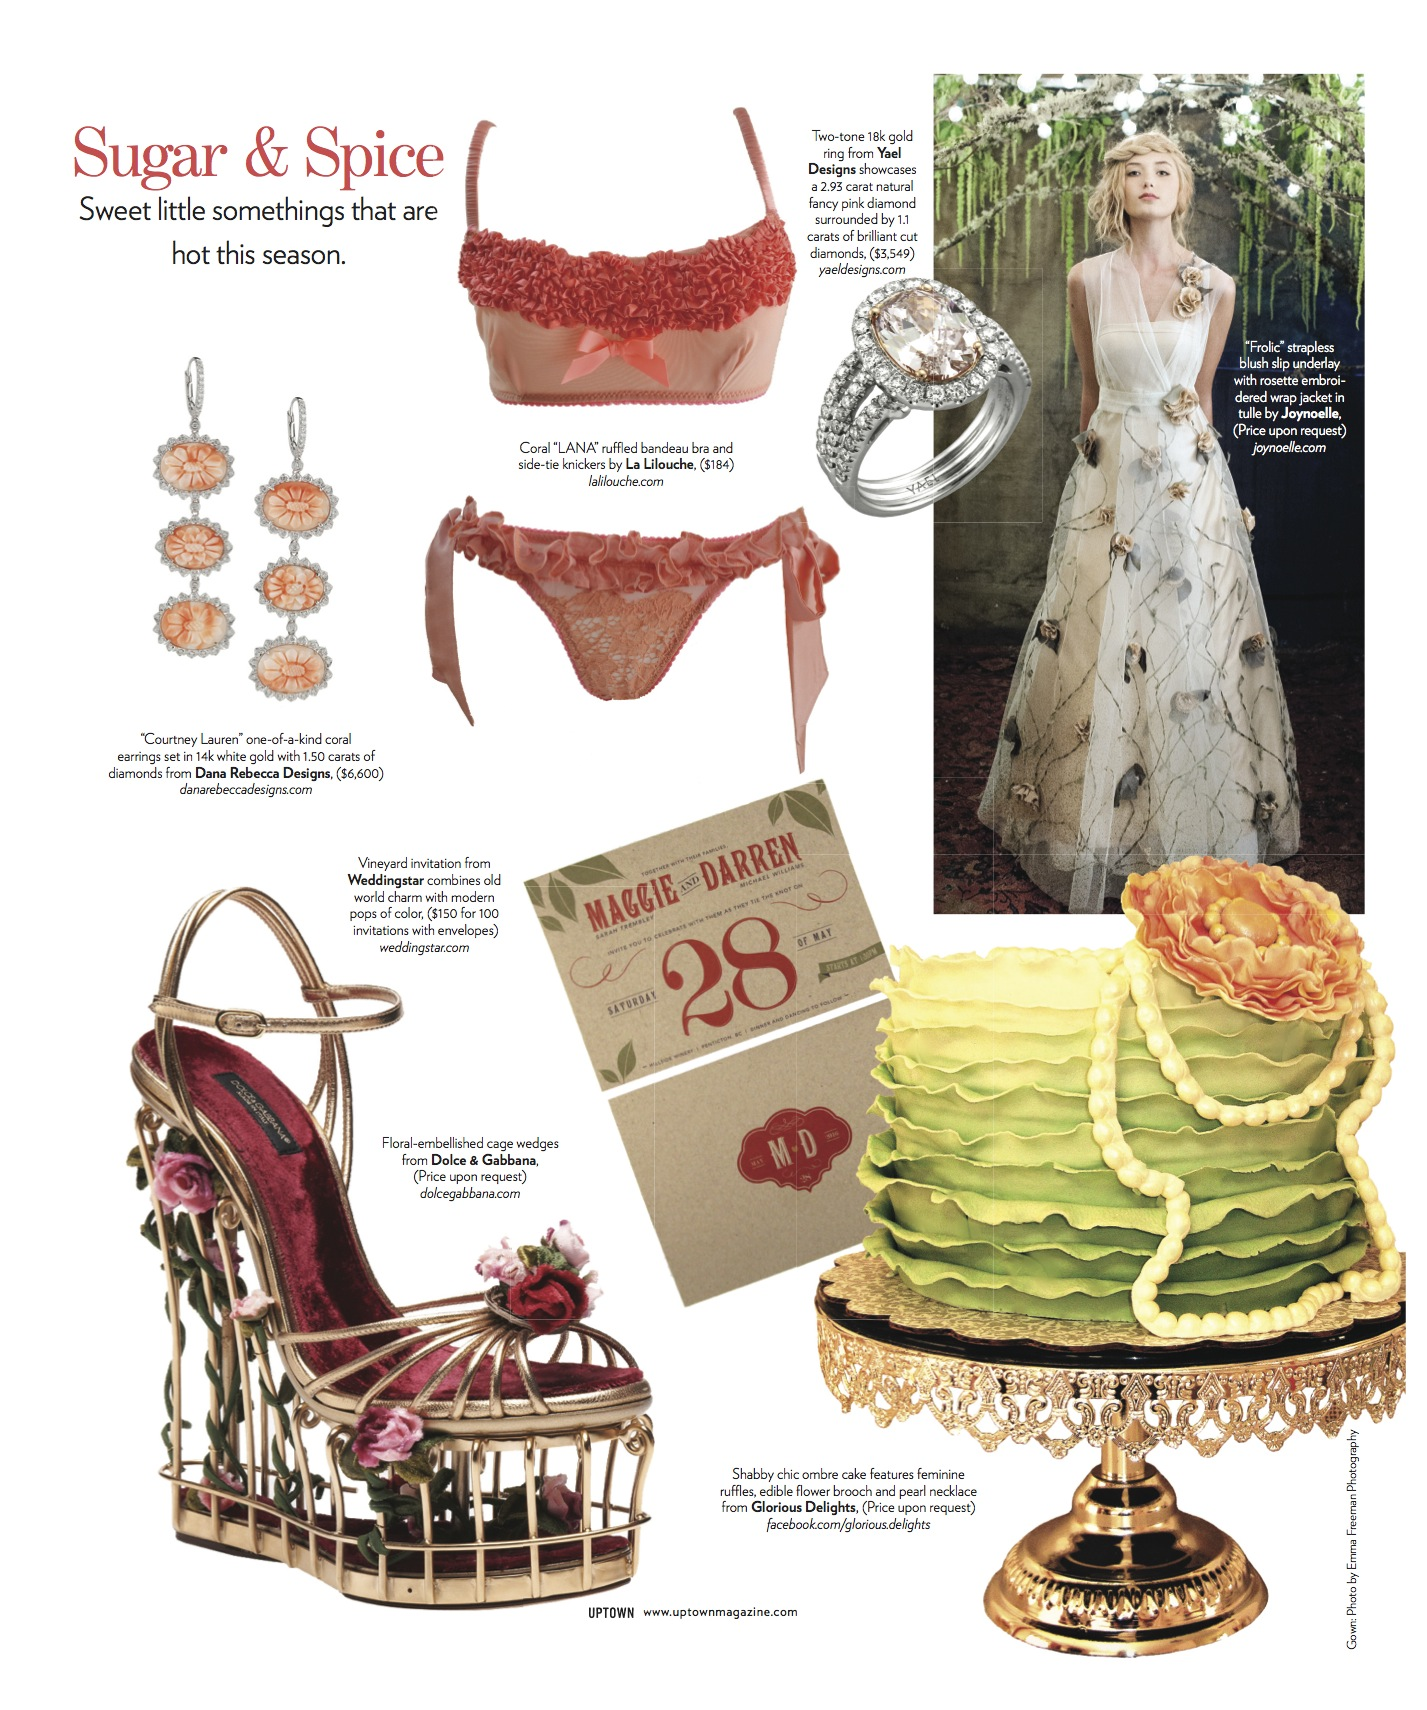 Uptown magazine features Weddingstar invitation and Yael Designs engagement ring. November 2013